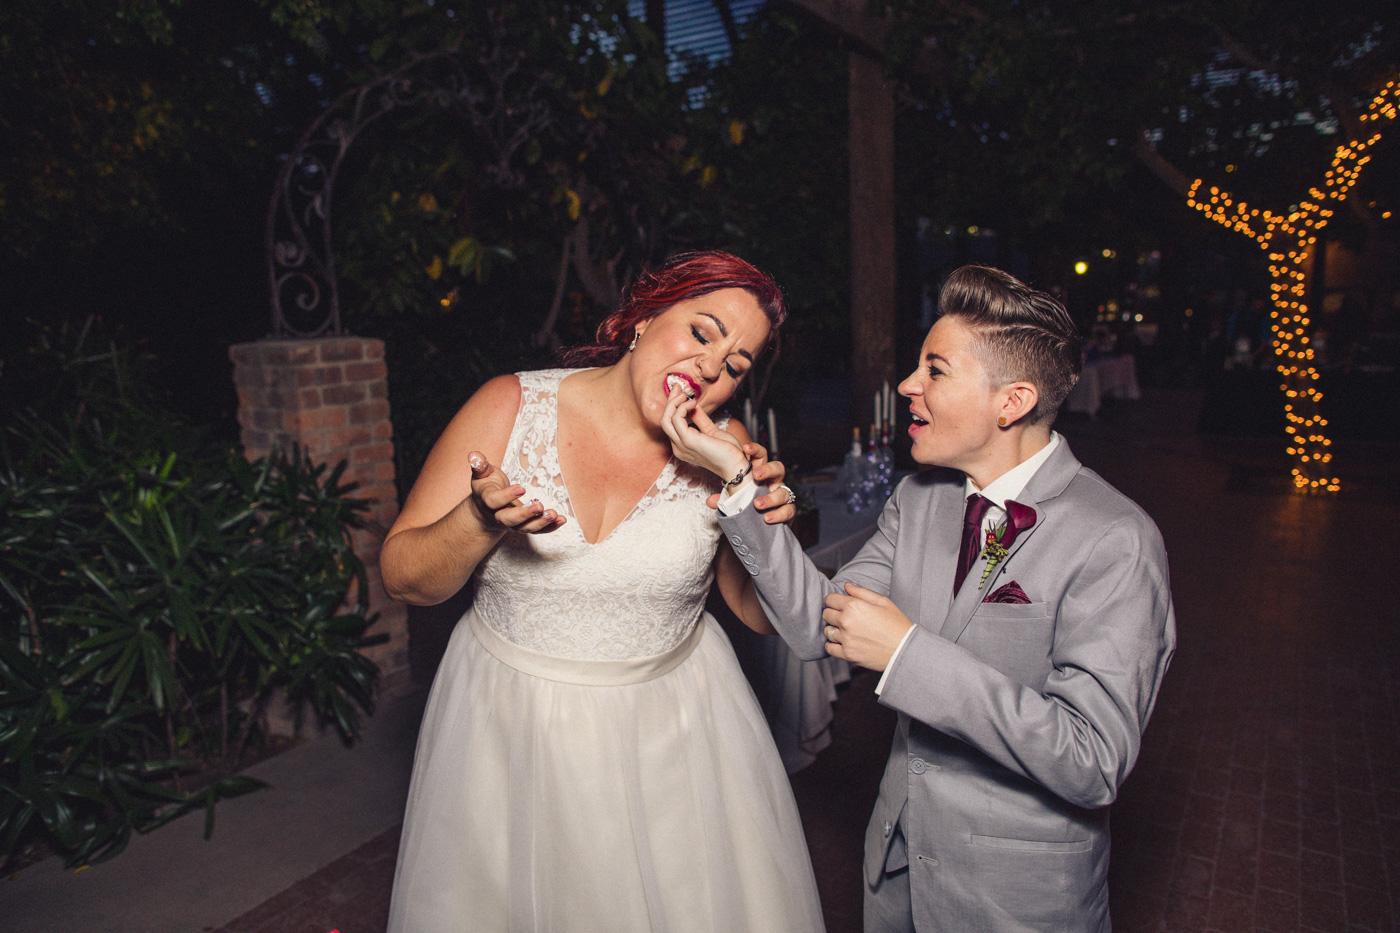 aaron-kes-photography-cake-feeding-wedding-photo